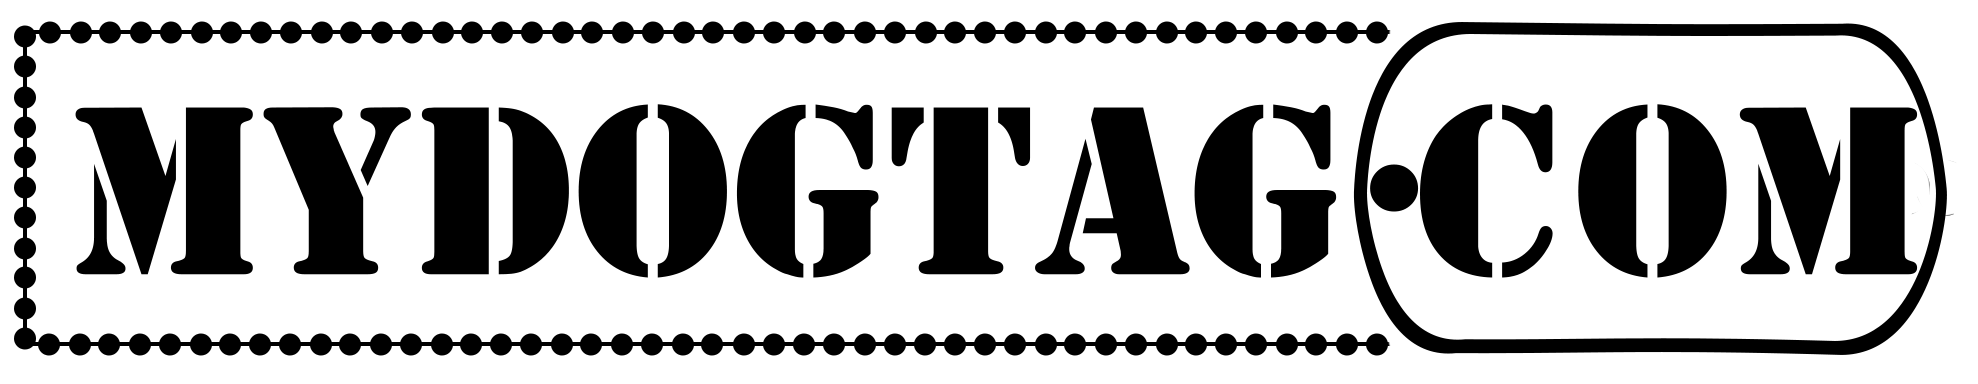 32832028-e61f-47fb-a3e3-e060aa127575